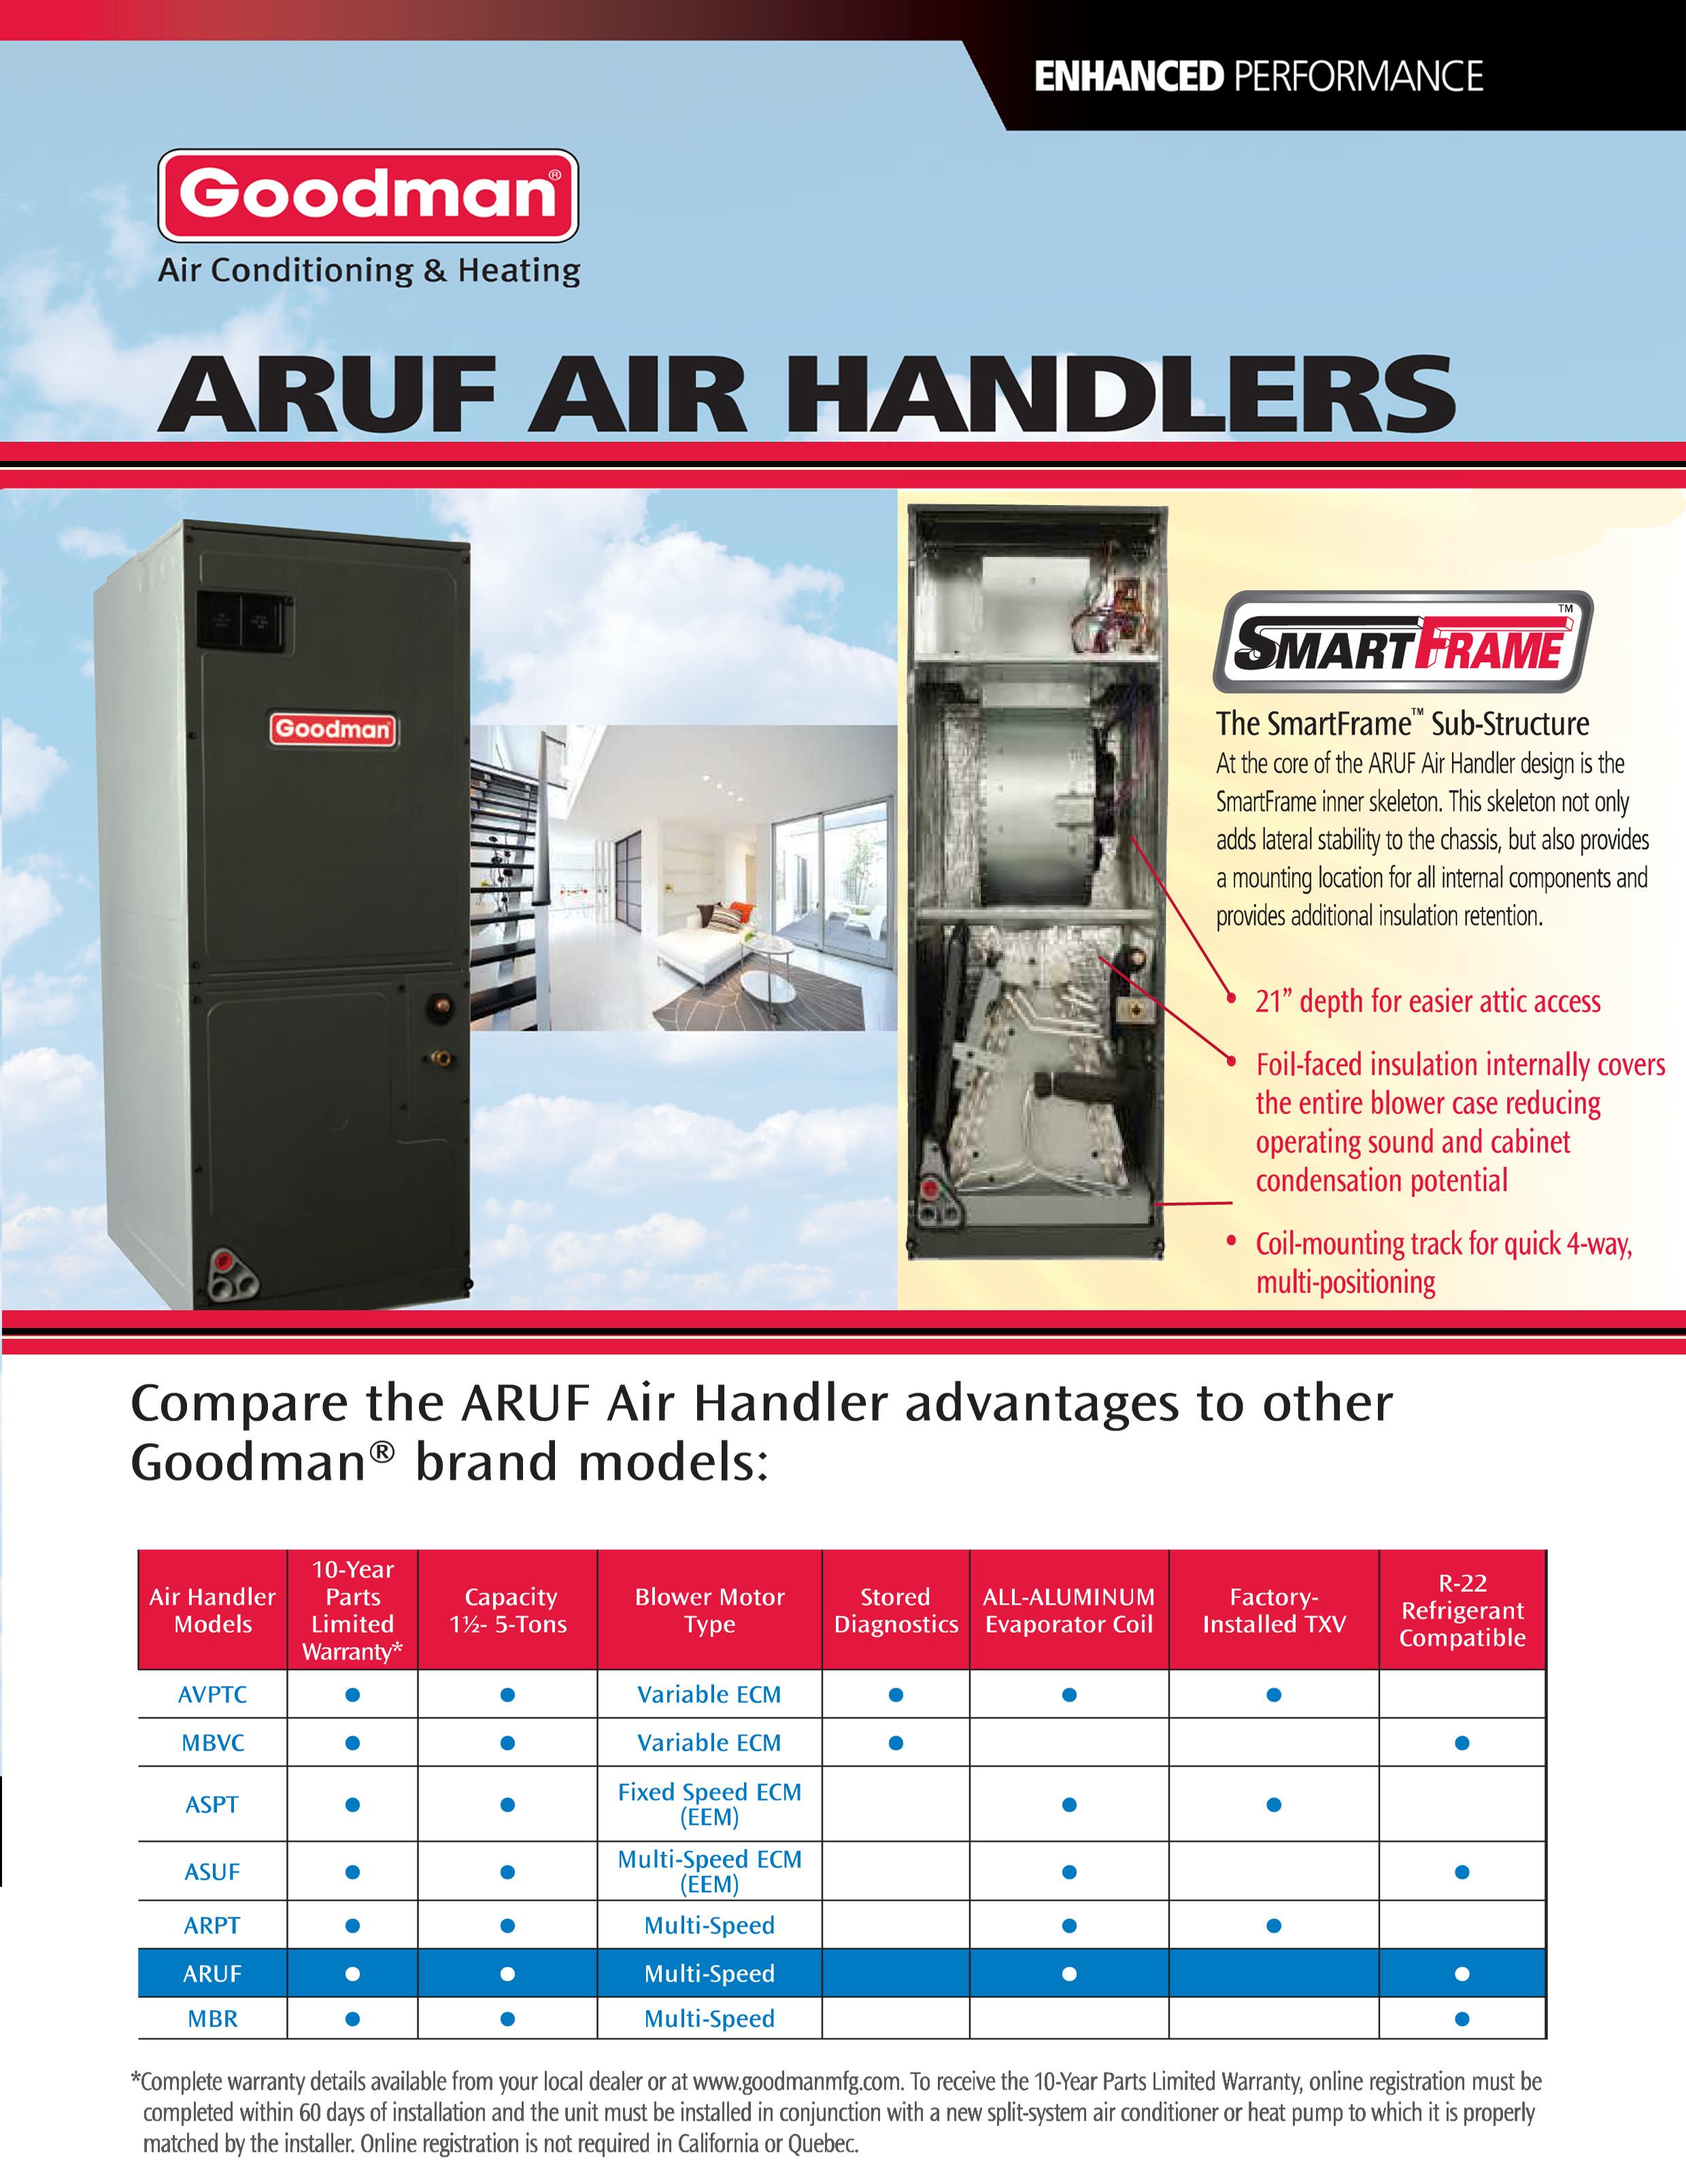 4 Ton Daikin 14 Seer Heat Pump Split System 3 Phase Dz14sa048 Goodman Gas Furnace Wiring Diagram Of Residential Central Aruf61d14 Txv